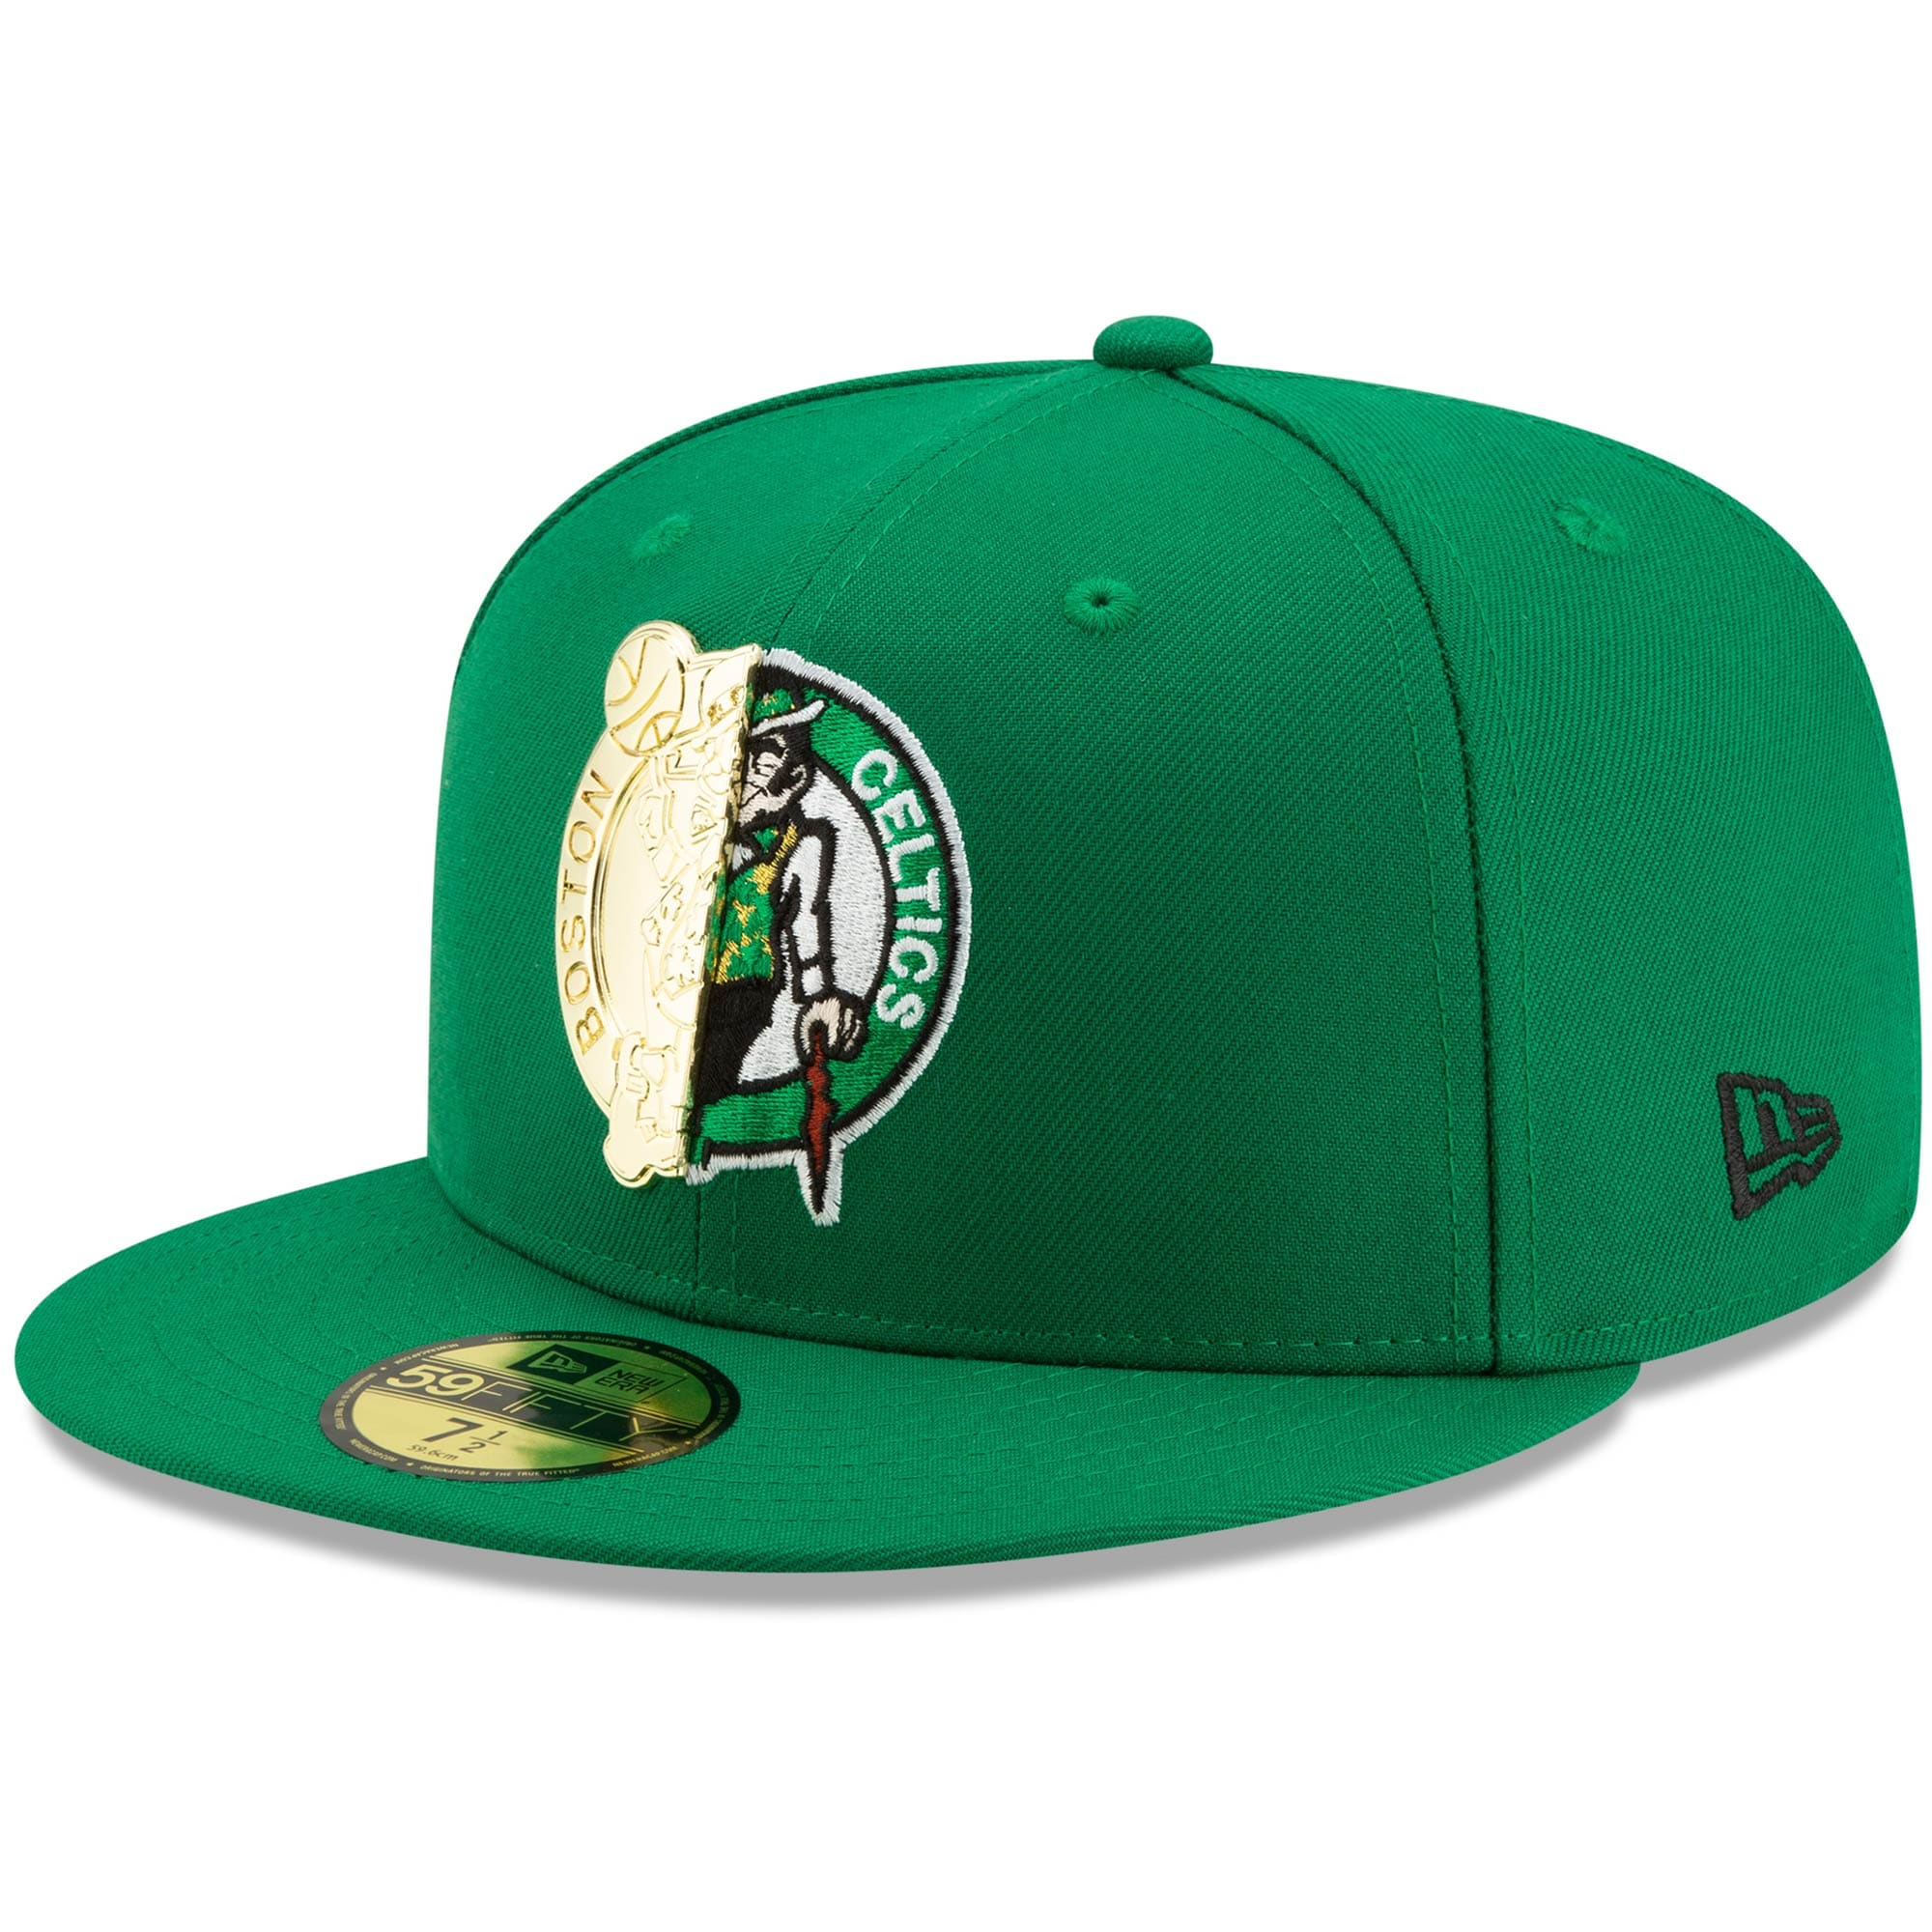 Boston Celtics New Era Split Metal & Thread 59FIFTY Fitted Hat - Kelly Green